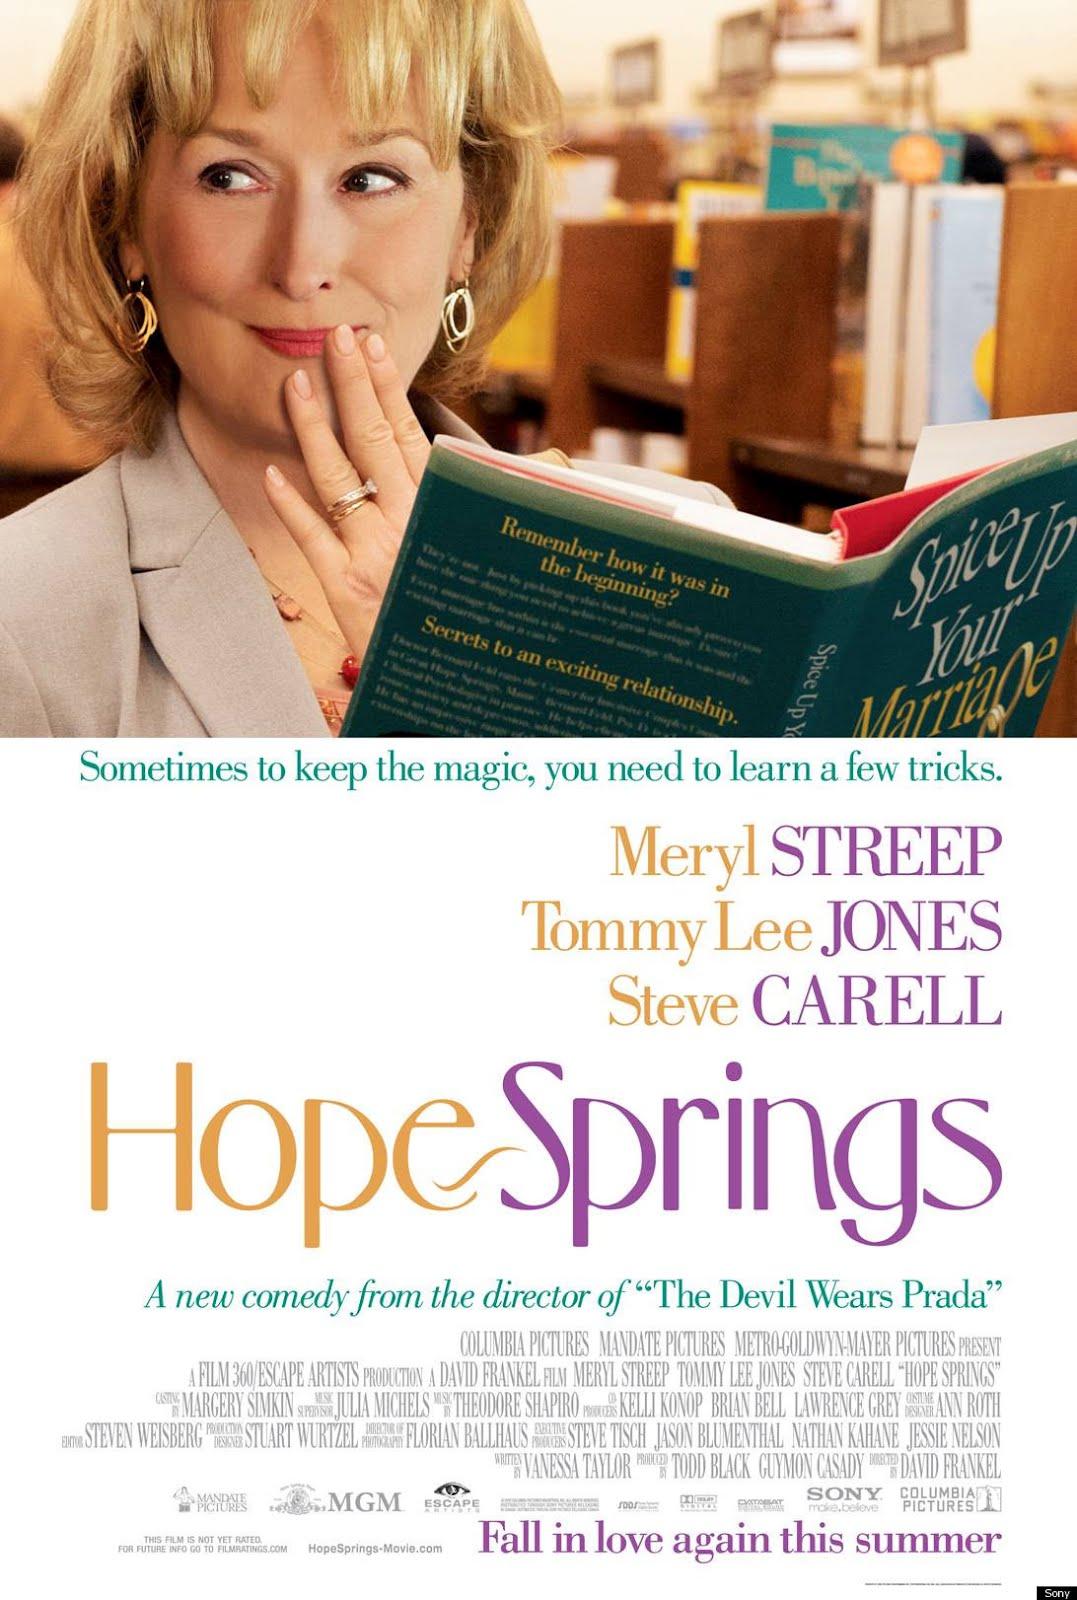 http://4.bp.blogspot.com/-UuqjHlBfygw/T5n1BXzrsII/AAAAAAAAACY/HFcyS1N2fxU/s1600/hope-springs-poster.jpg